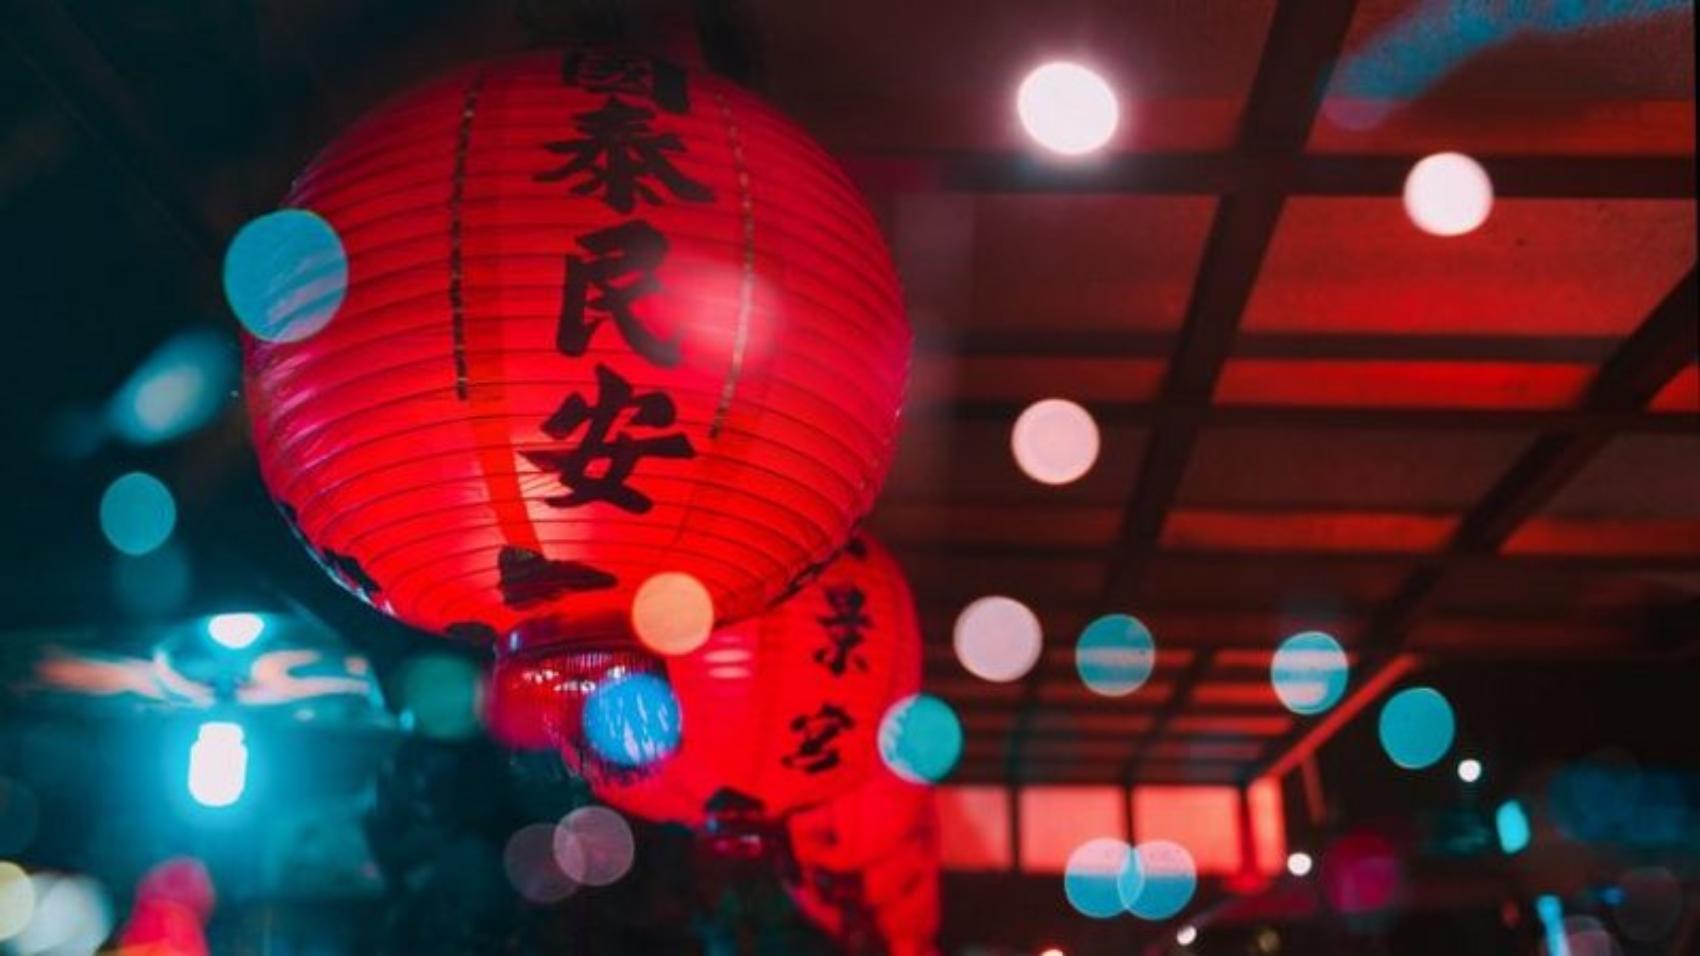 lantern-3713468_1920-768x432